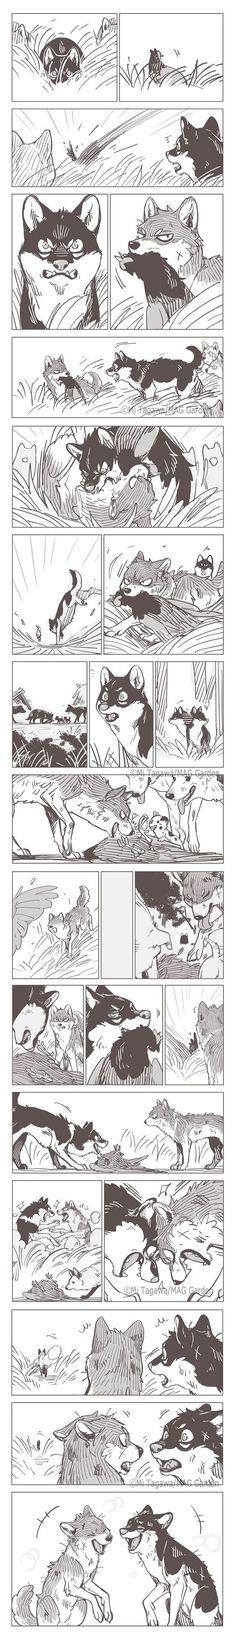 Fantasy Drawings, Fantasy Art, Wolf Comics, Monster Under The Bed, Comics Toons, Furry Comic, Short Comics, Cute Comics, Cat Art